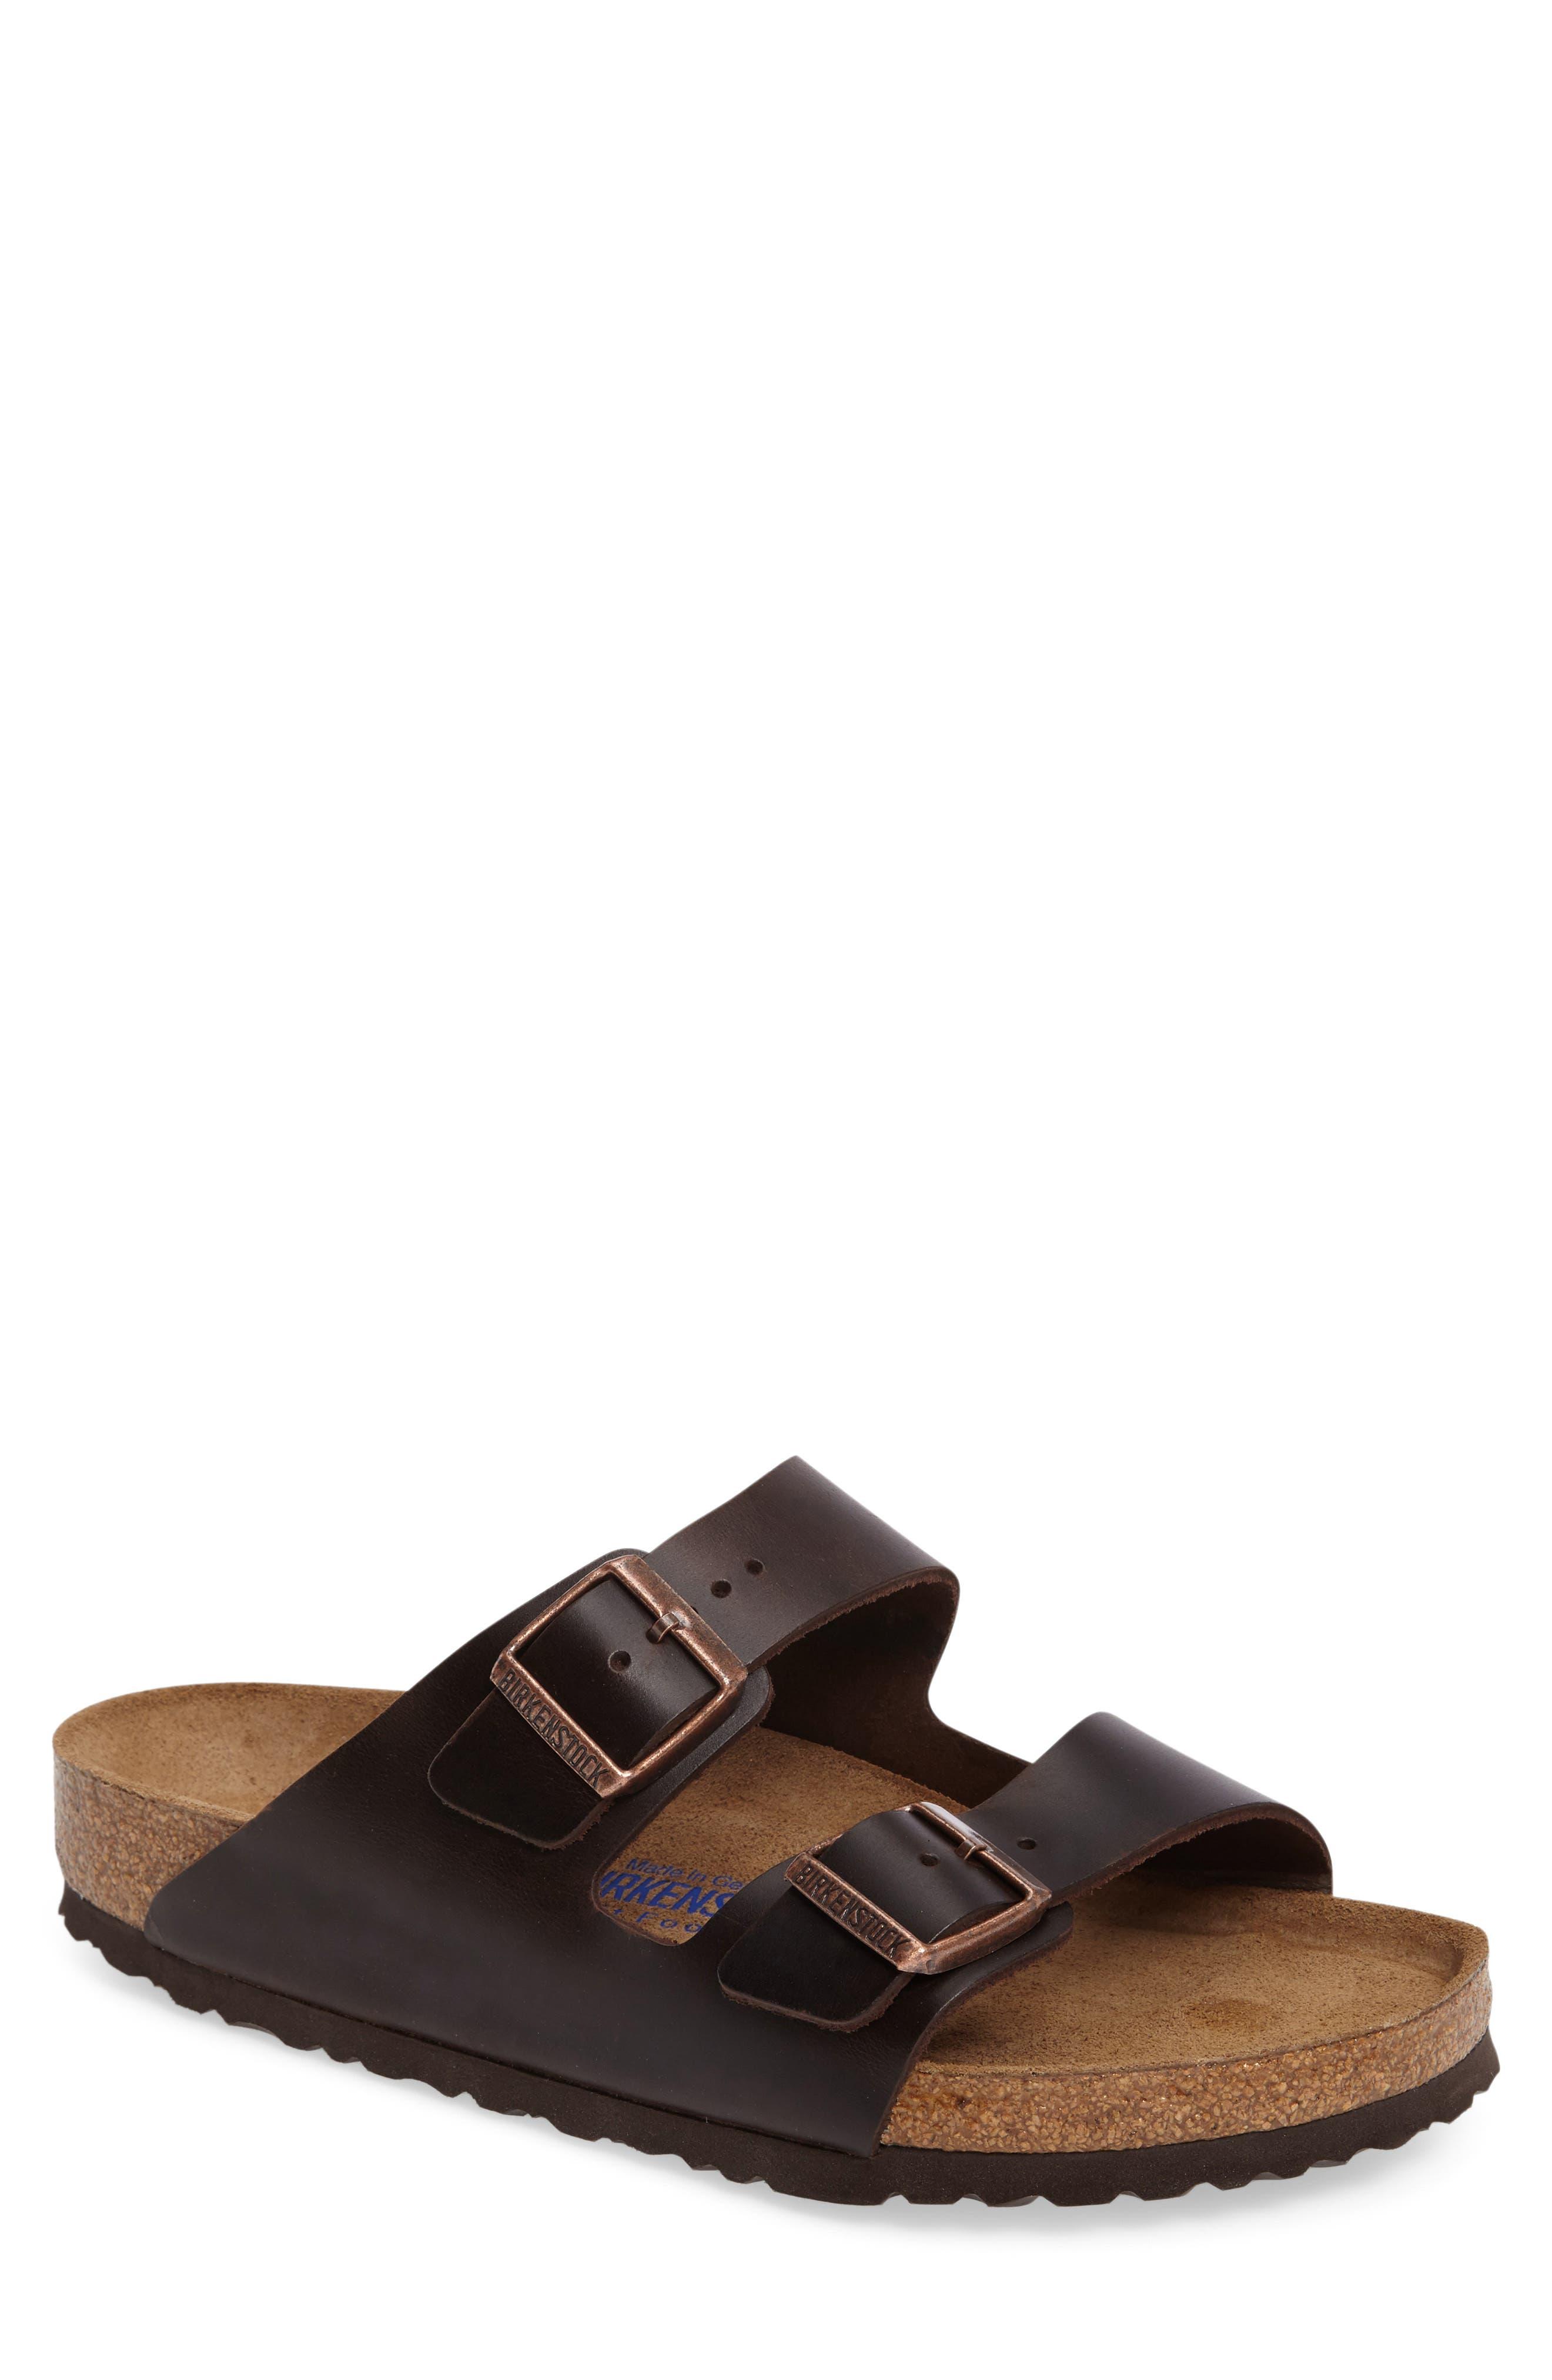 'Arizona Soft' Sandal,                             Main thumbnail 1, color,                             Brown